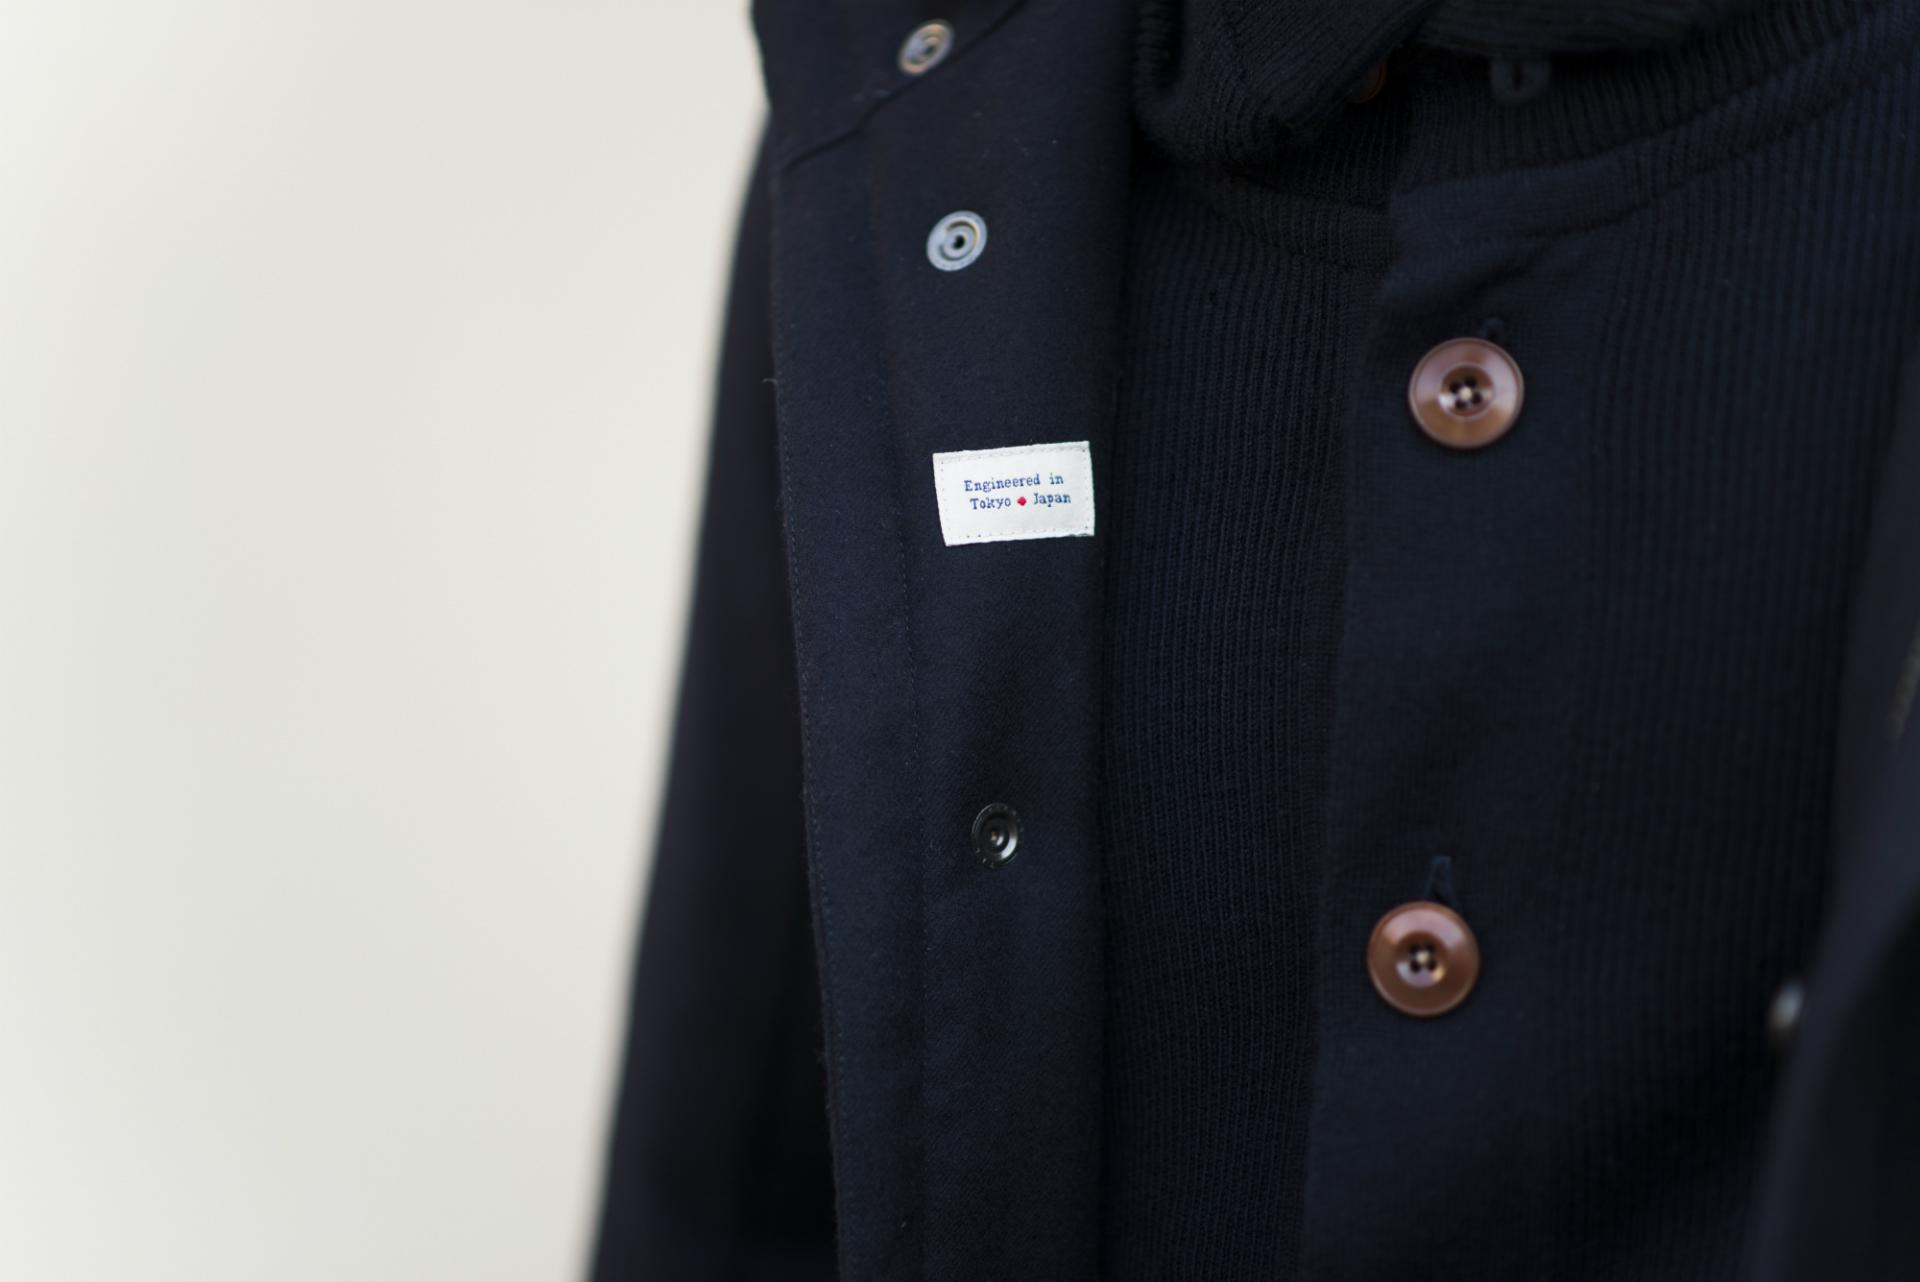 mida firenze tokyo abbigliamento uomo donna casualwear outerwear capispalla made in tuscany